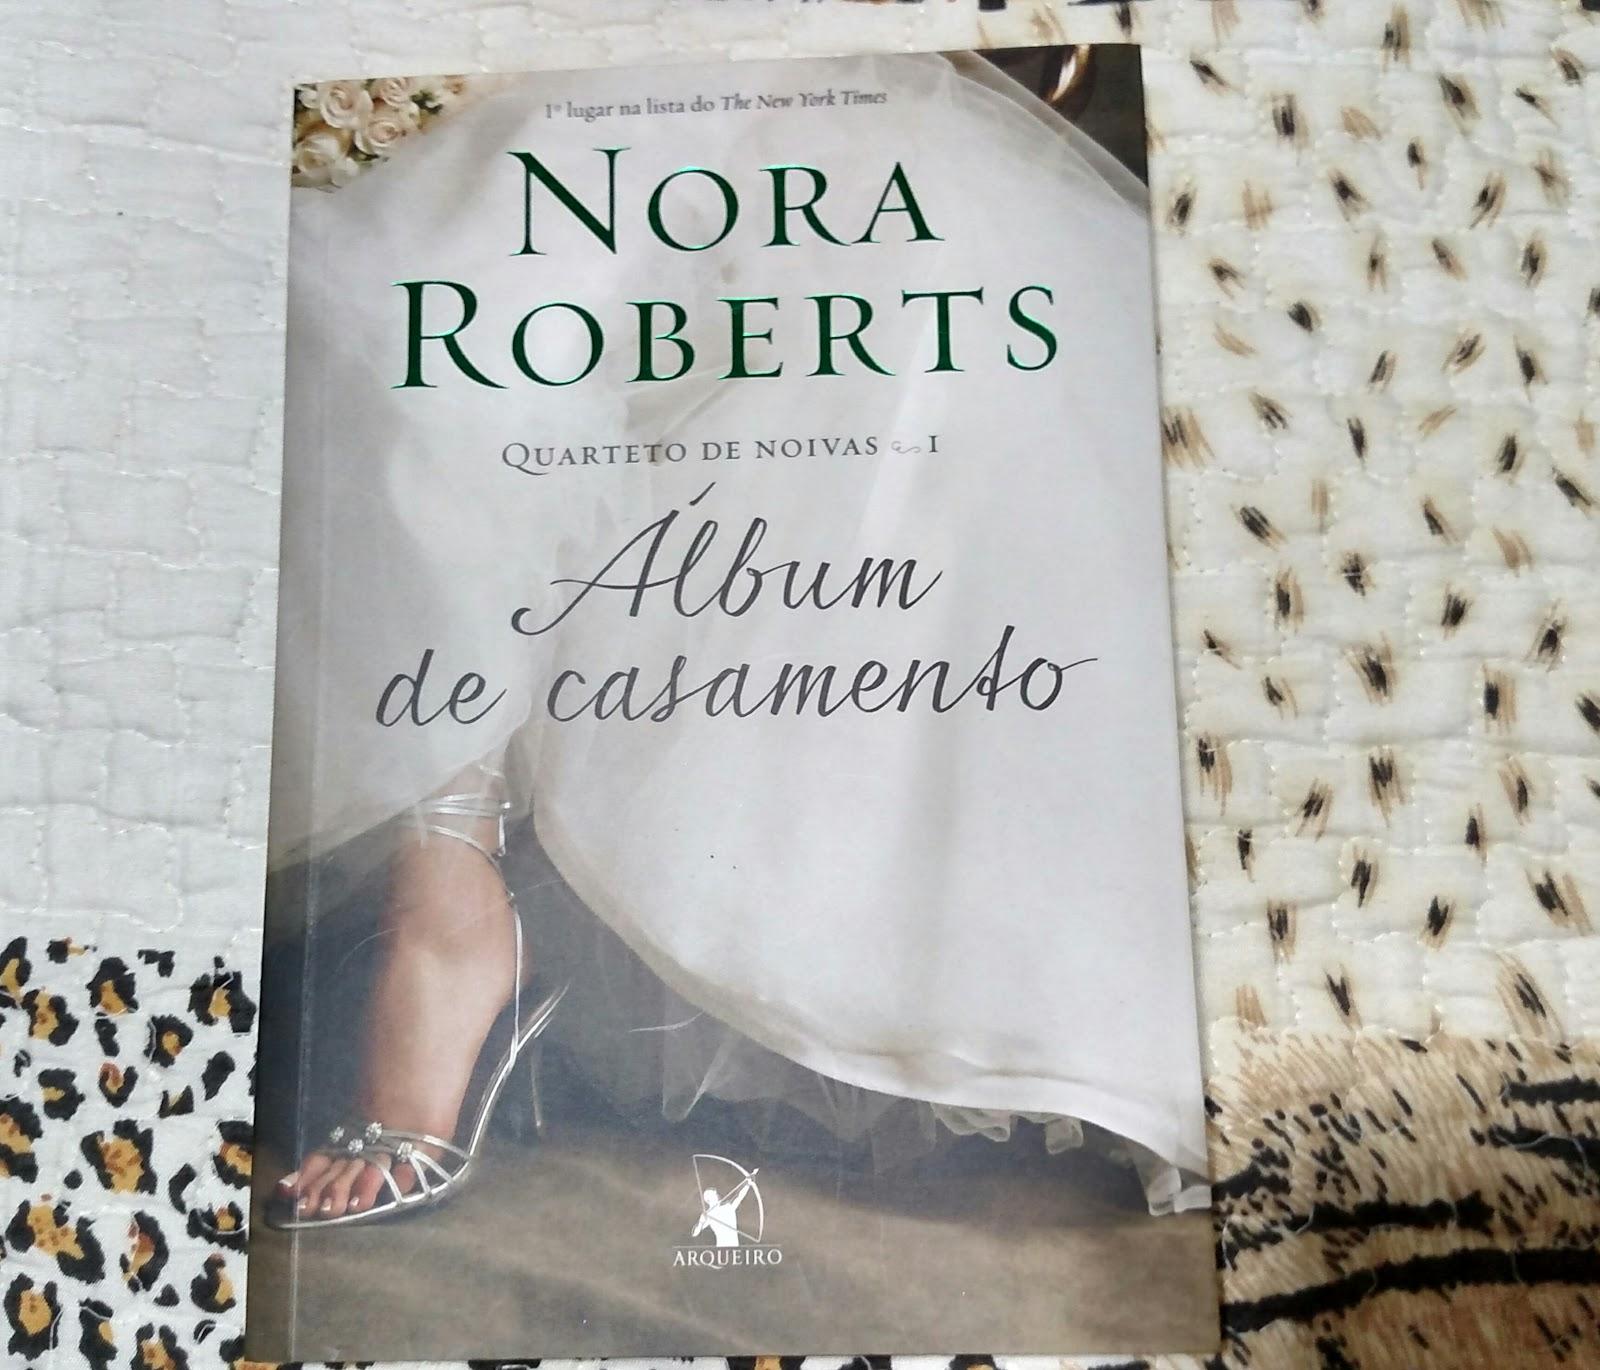 ALBUM DE CASAMENTO NORA ROBERTS PDF